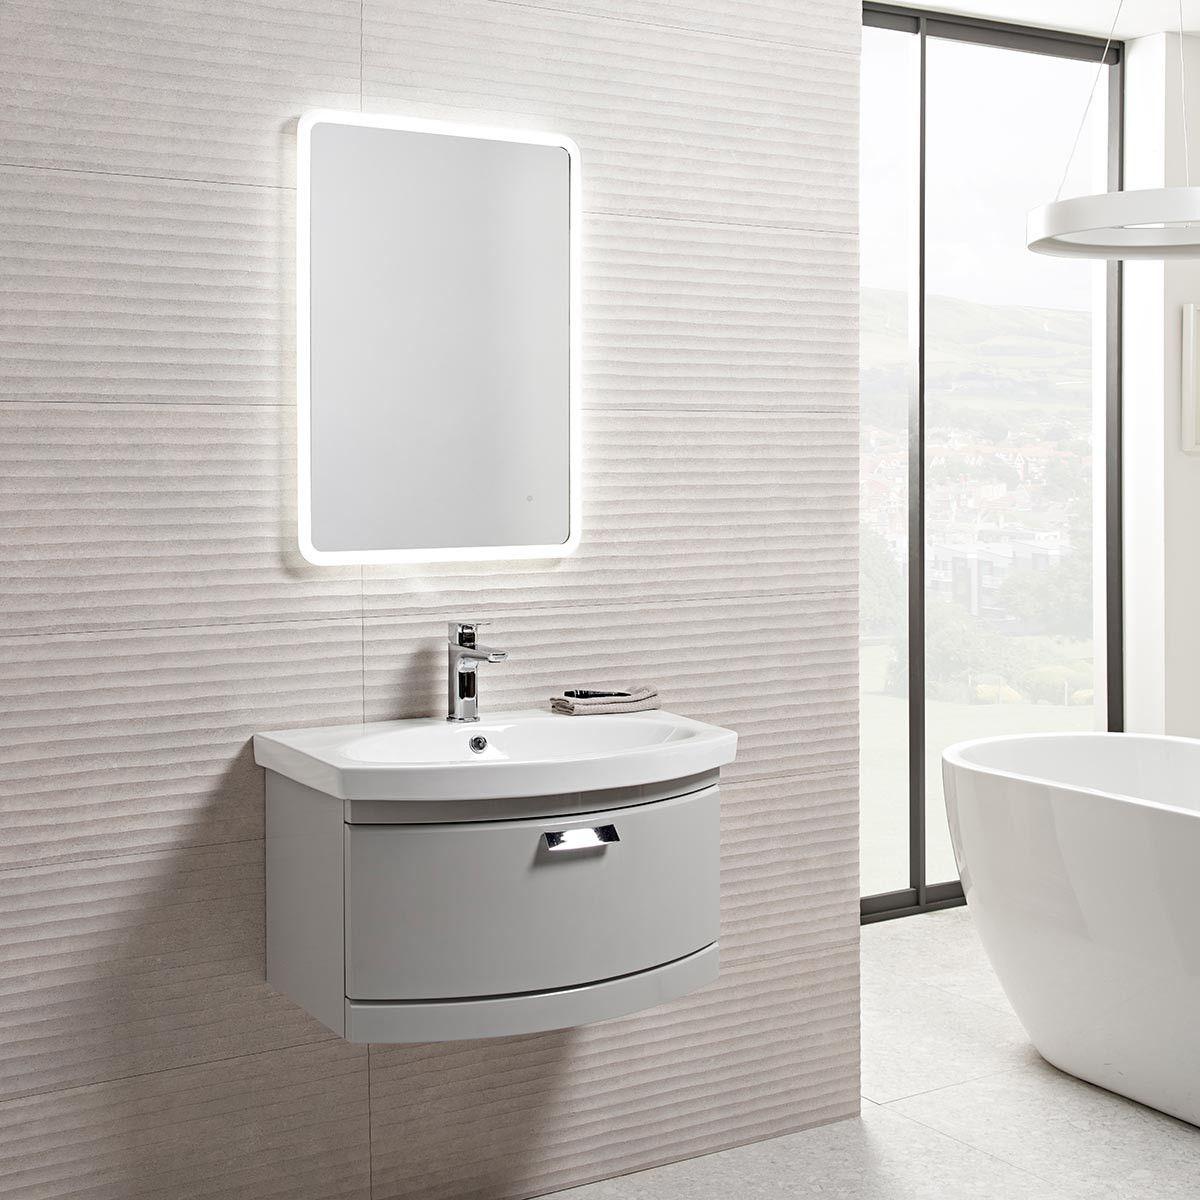 Tavistock Aster LED Backlit Illuminated Mirror 500 x 700 | Tavistock ...